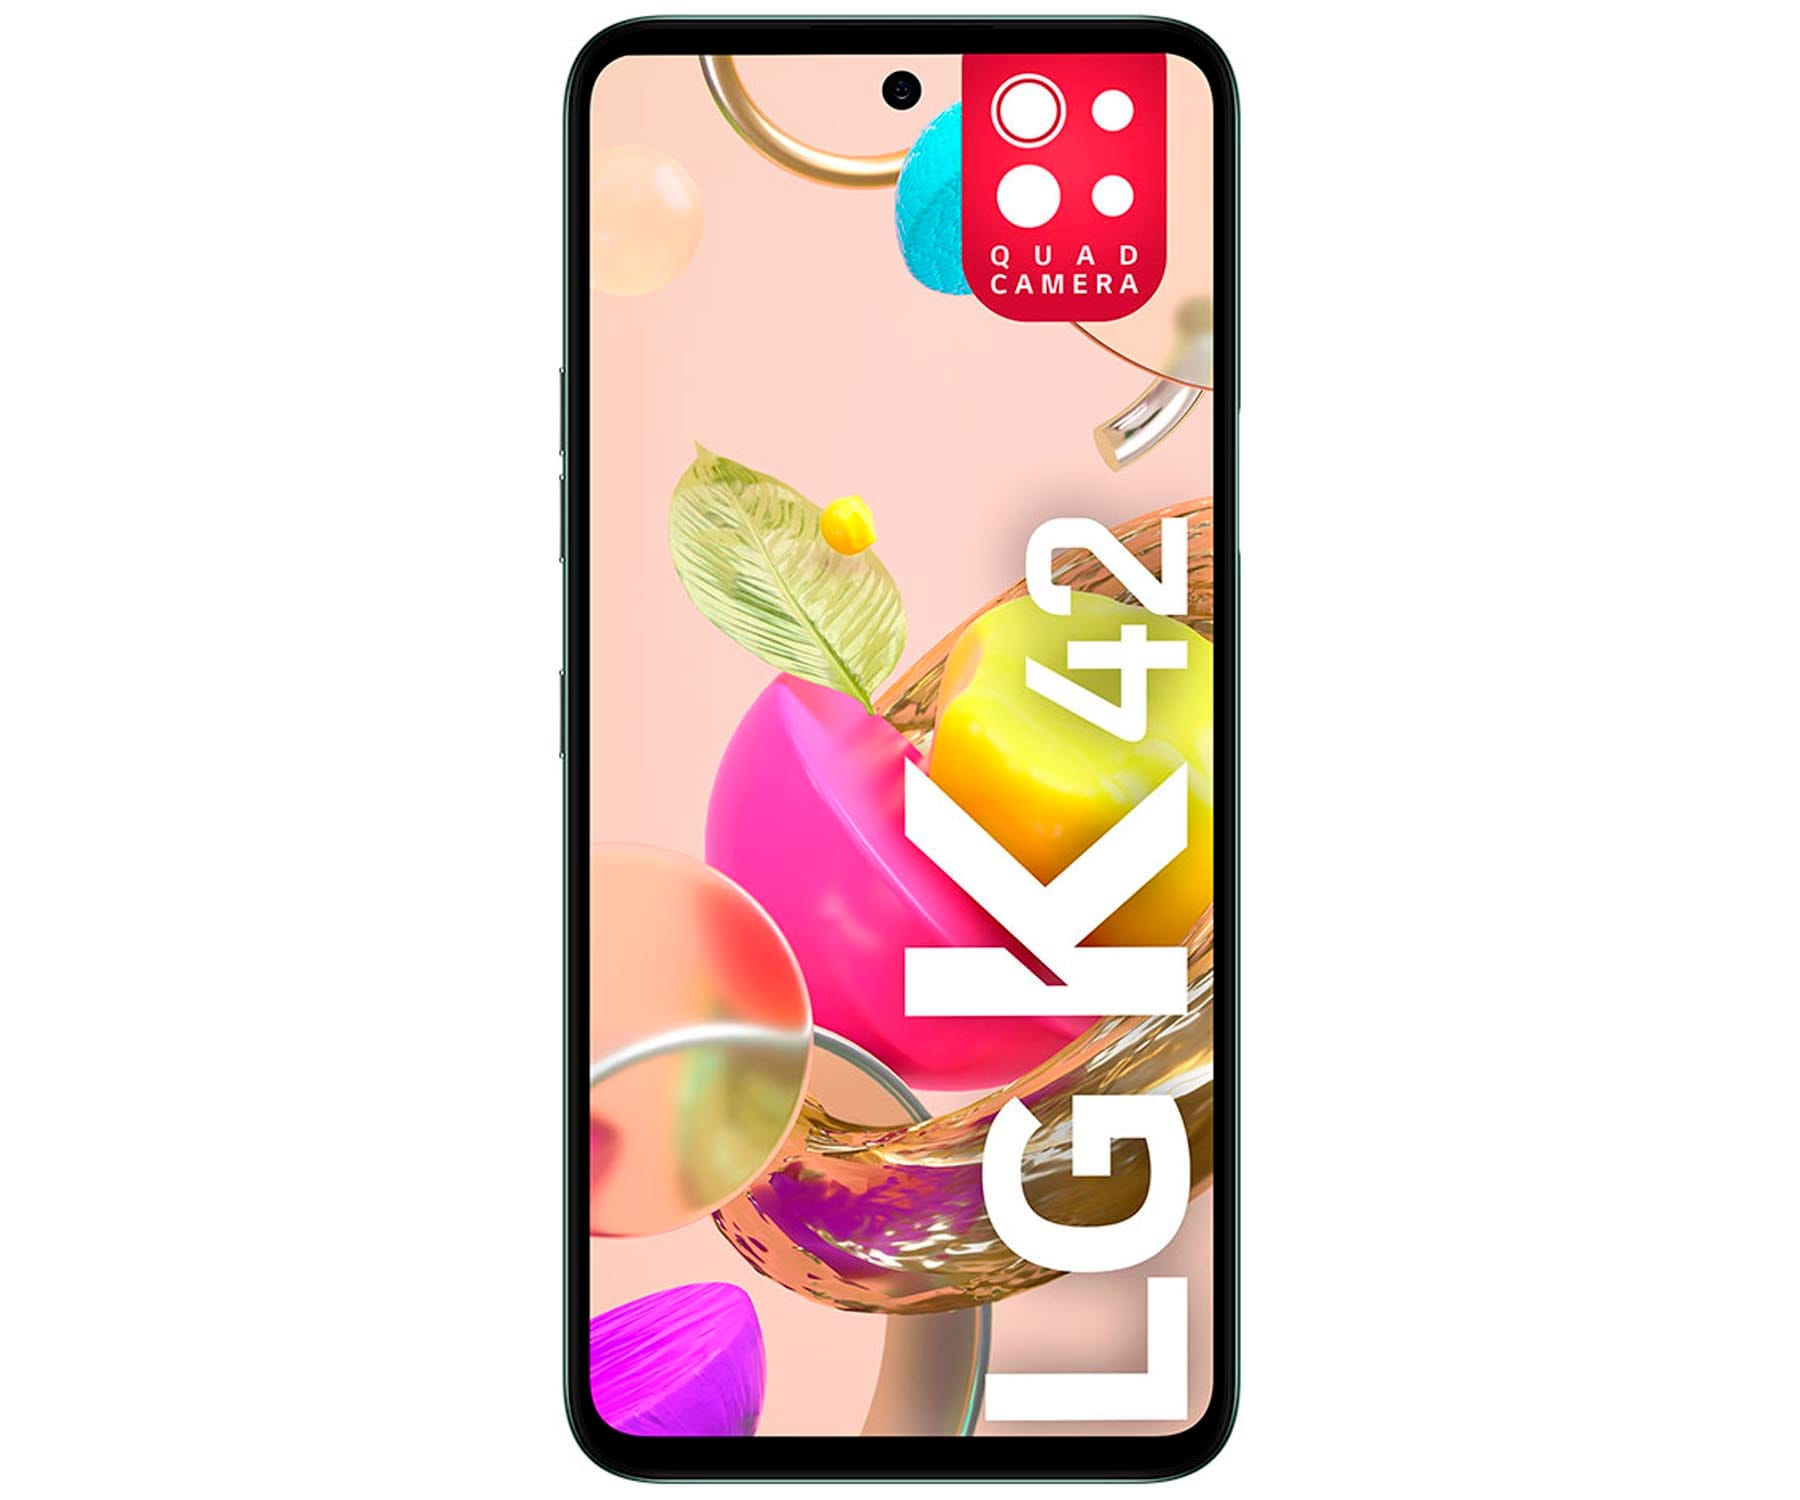 LG K42 GRIS MÓVIL 4G DUAL SIM 6.6'' IPS HD+ OCTACORE 64GB 3GB RAM QUADCAM 13MP SELFIES 8MP